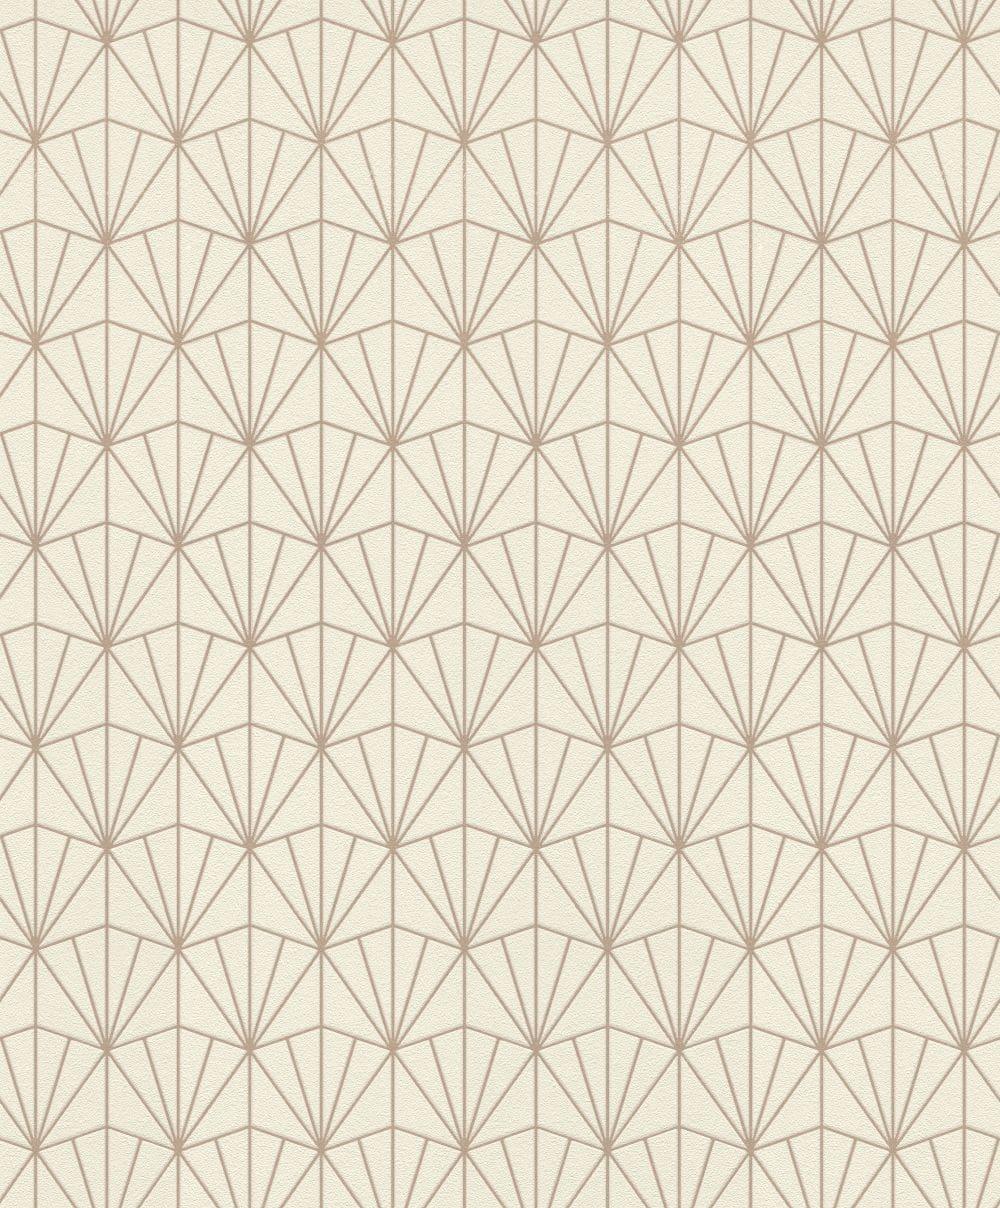 Albany Deco Diamond Linen Wallpaper - Product code: 434040